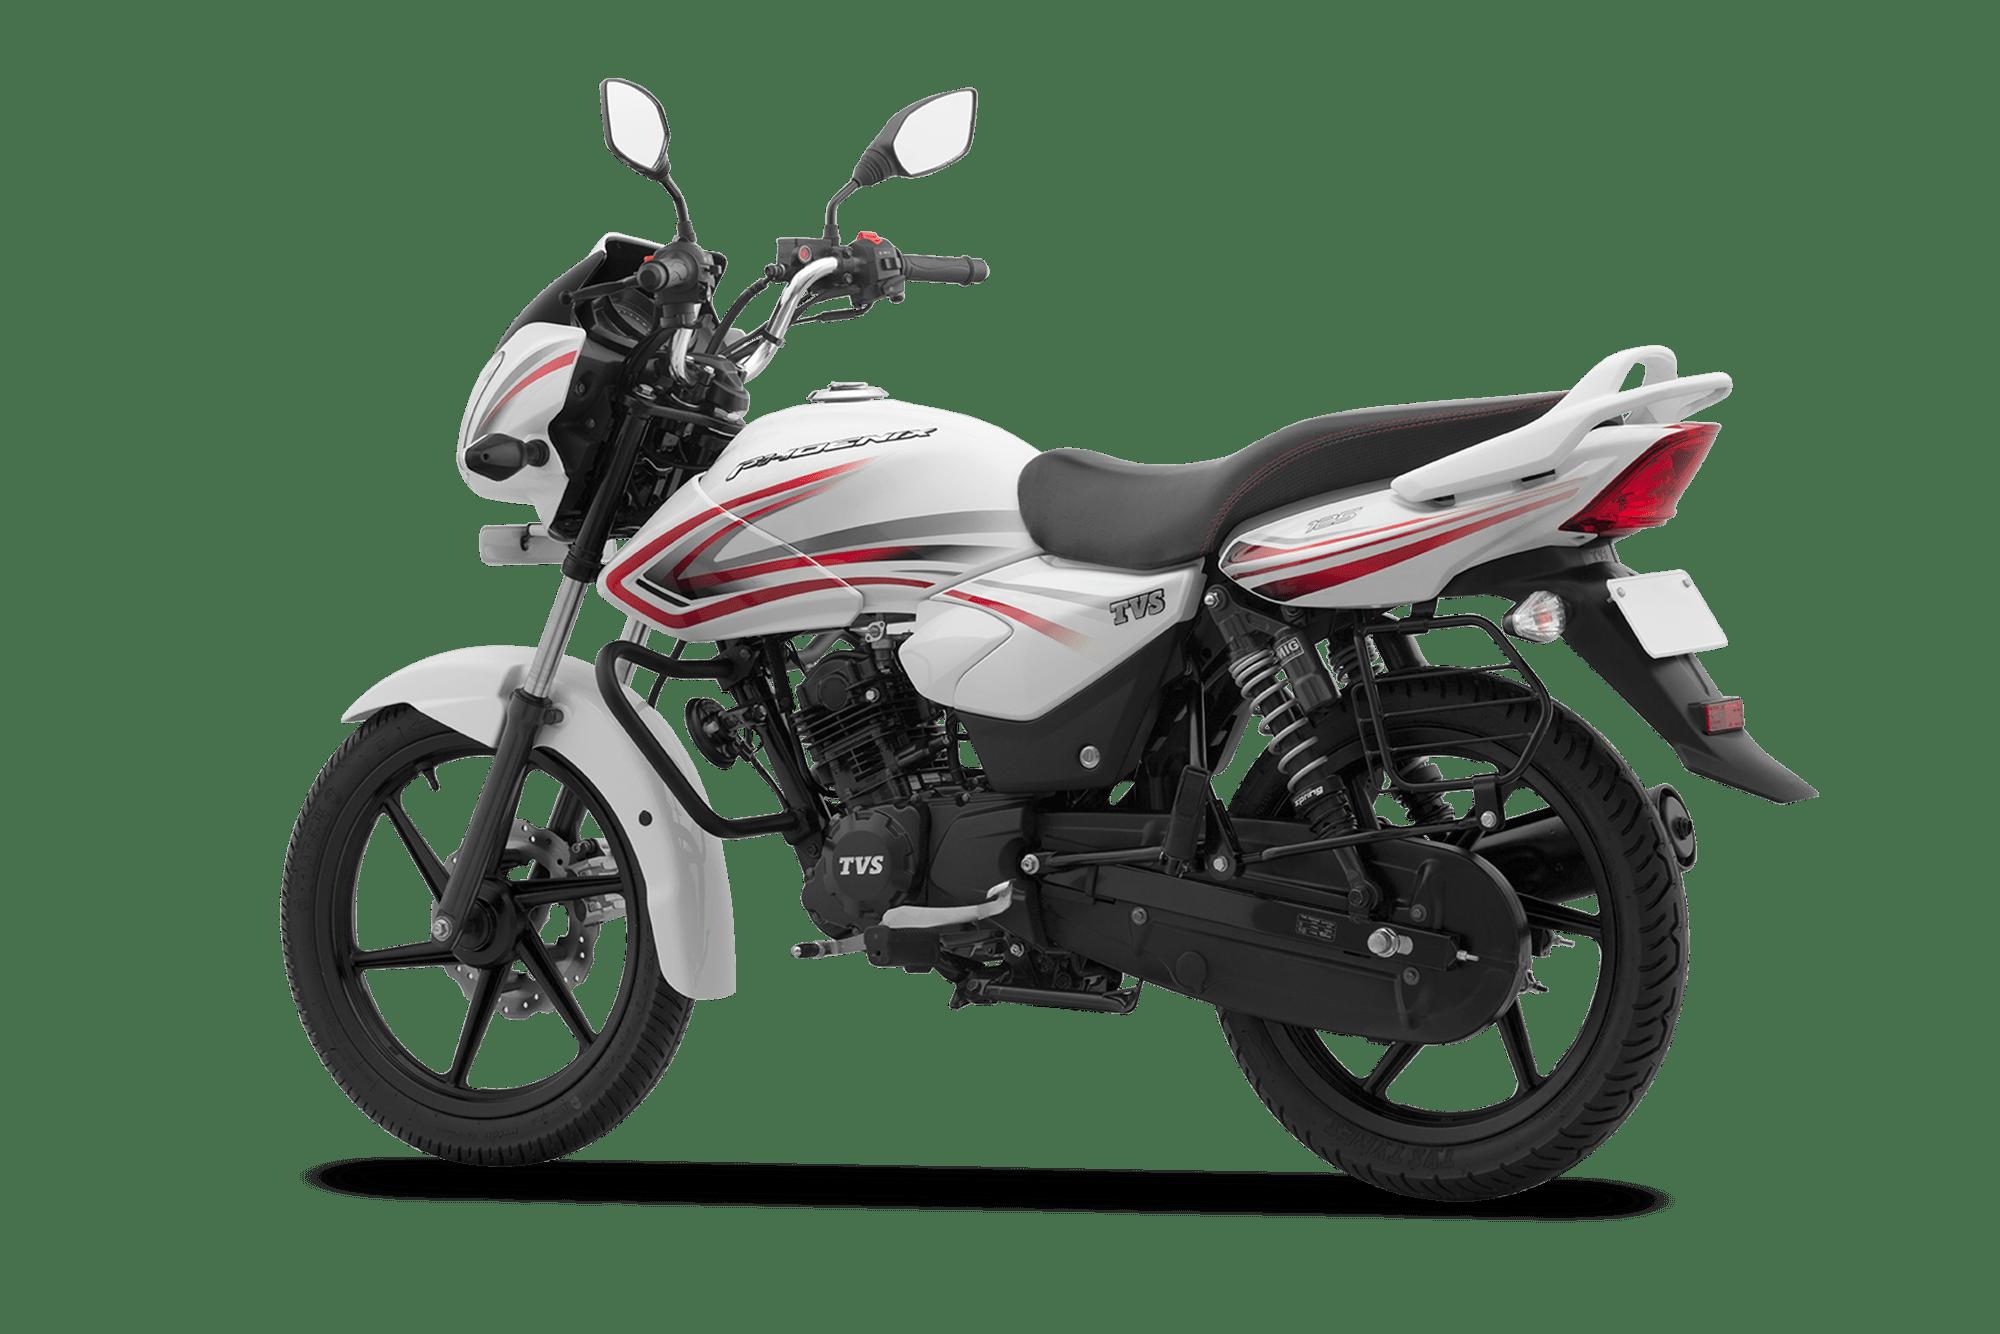 Motorcycle clipart pineapple. Tvs phoenix mileage bike